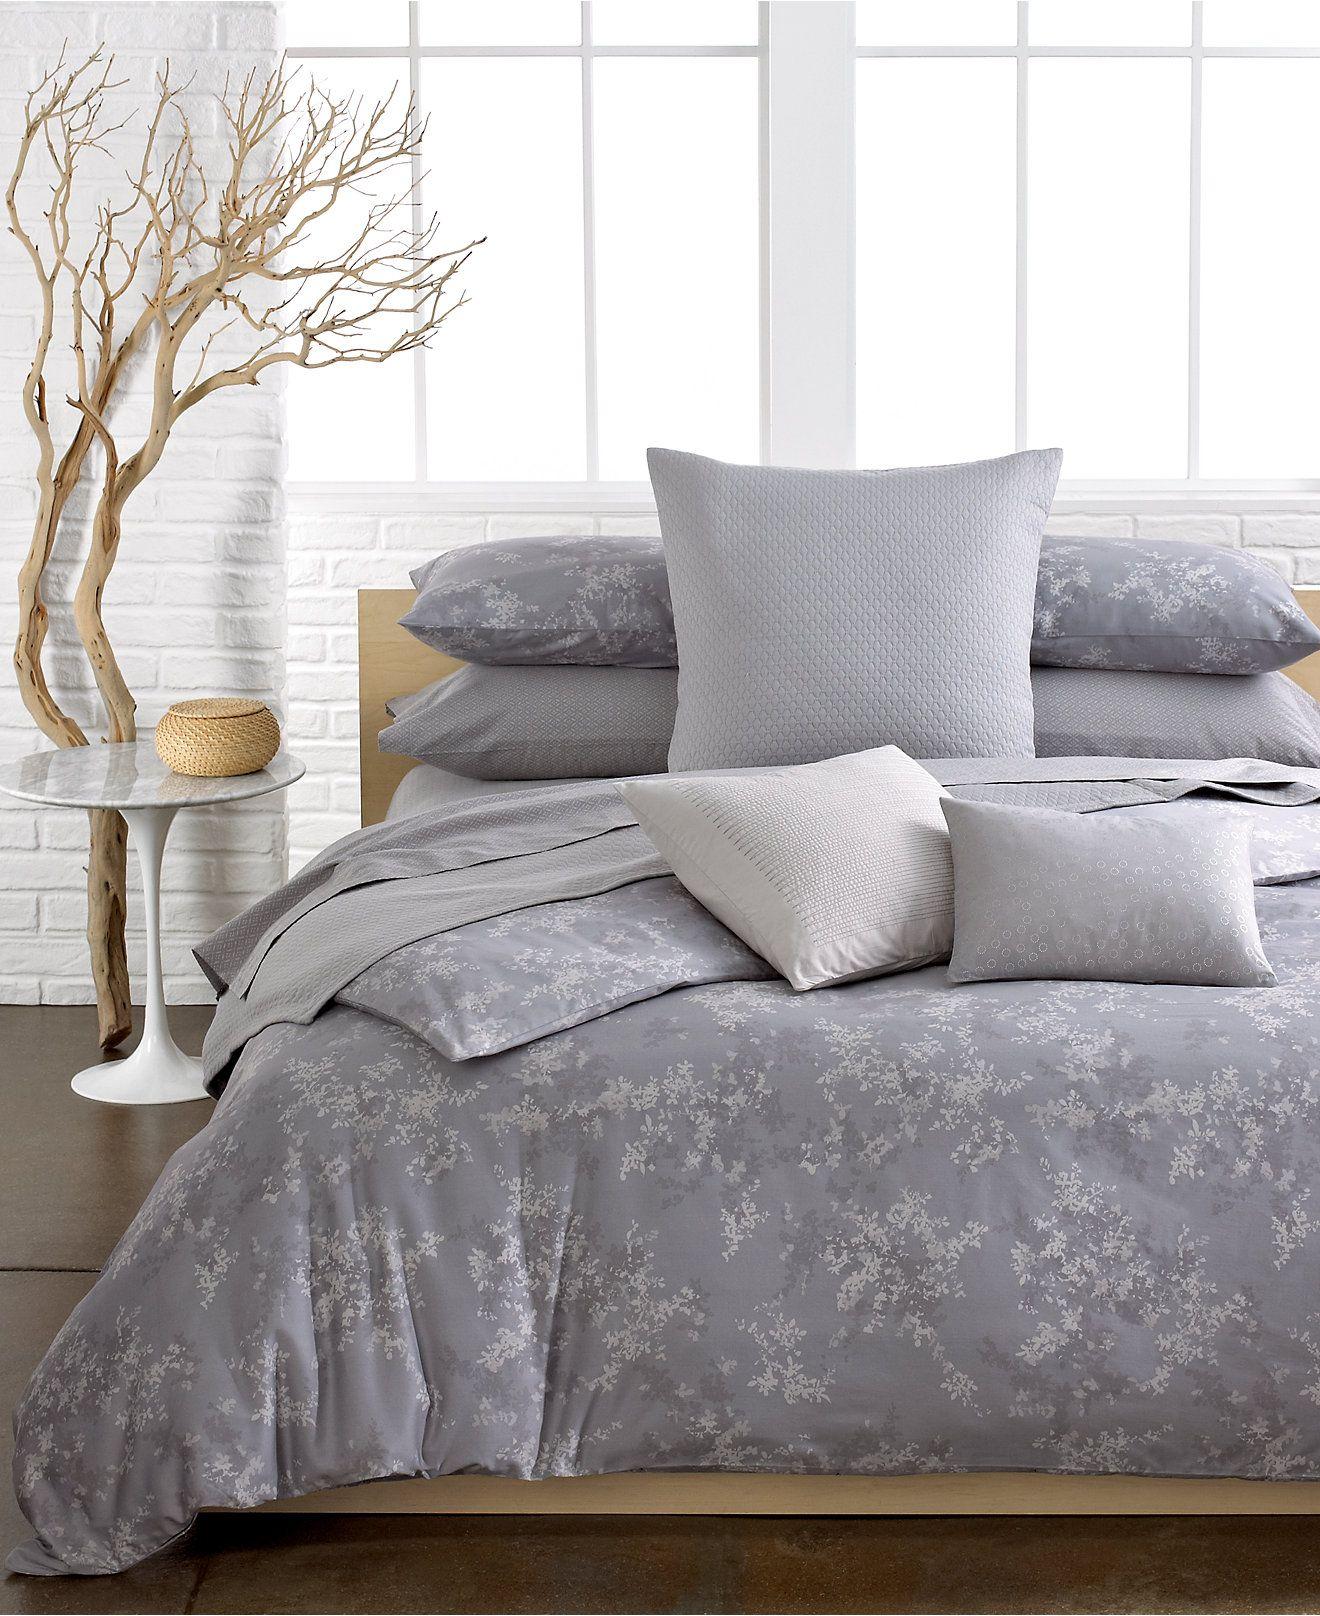 Calvin Klein Lilacs Comforter And Duvet Cover Sets Duvet Covers